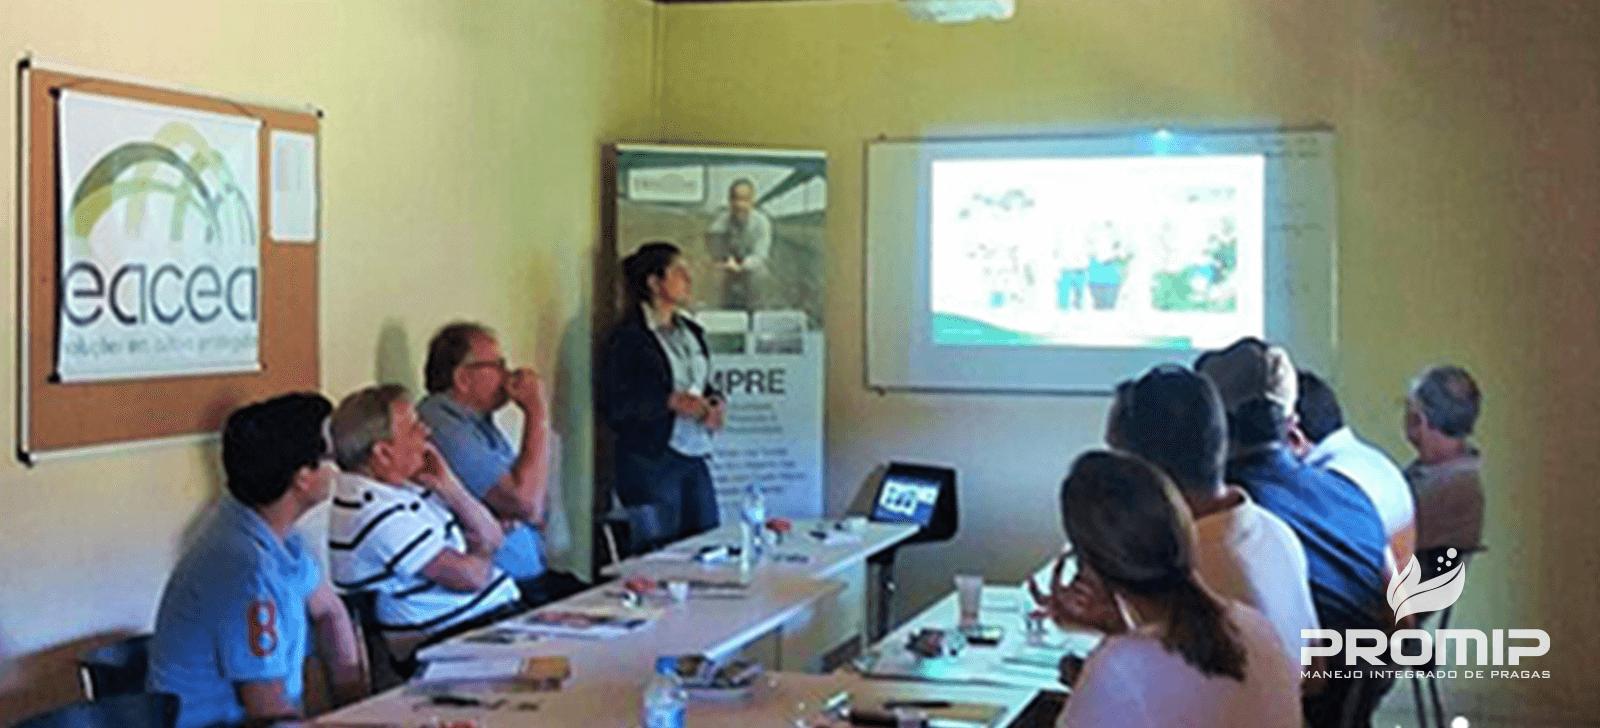 promip manejo integrado de pragas controle biologico transferencia conhecimento promio